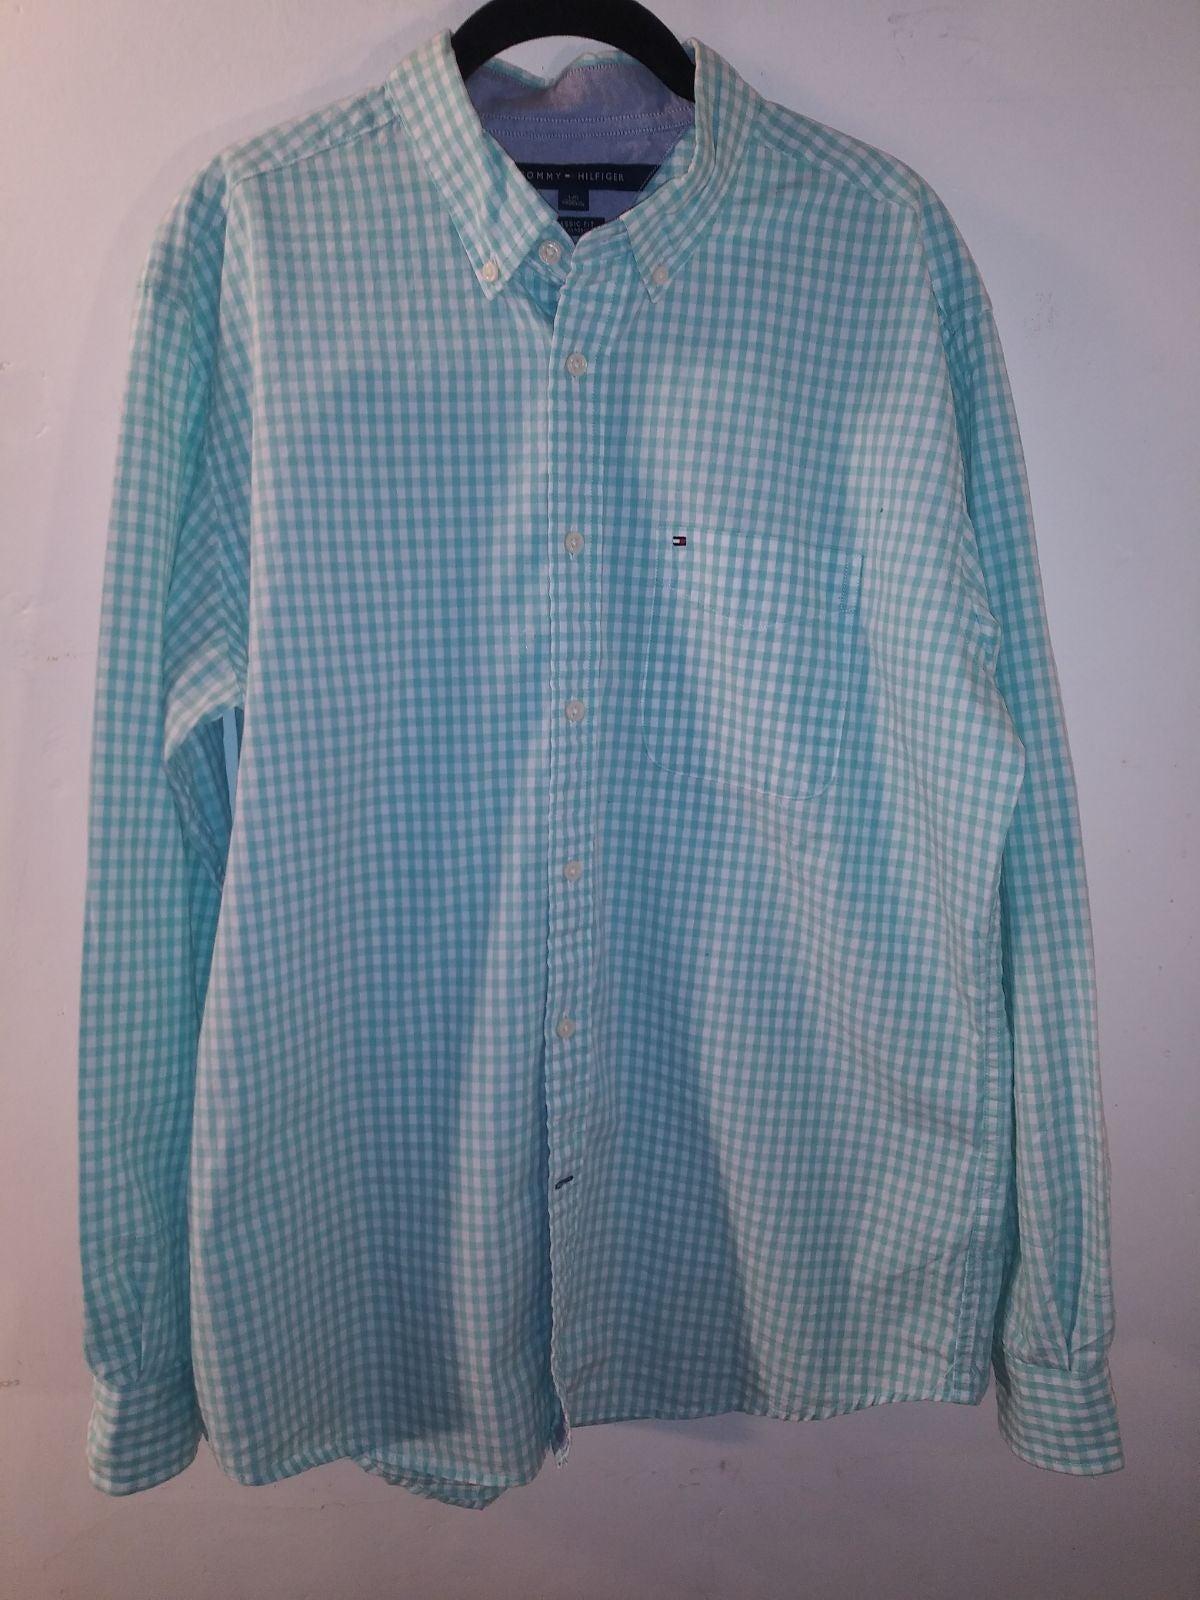 Tommy Hilfiger Mint/White Button Shirt